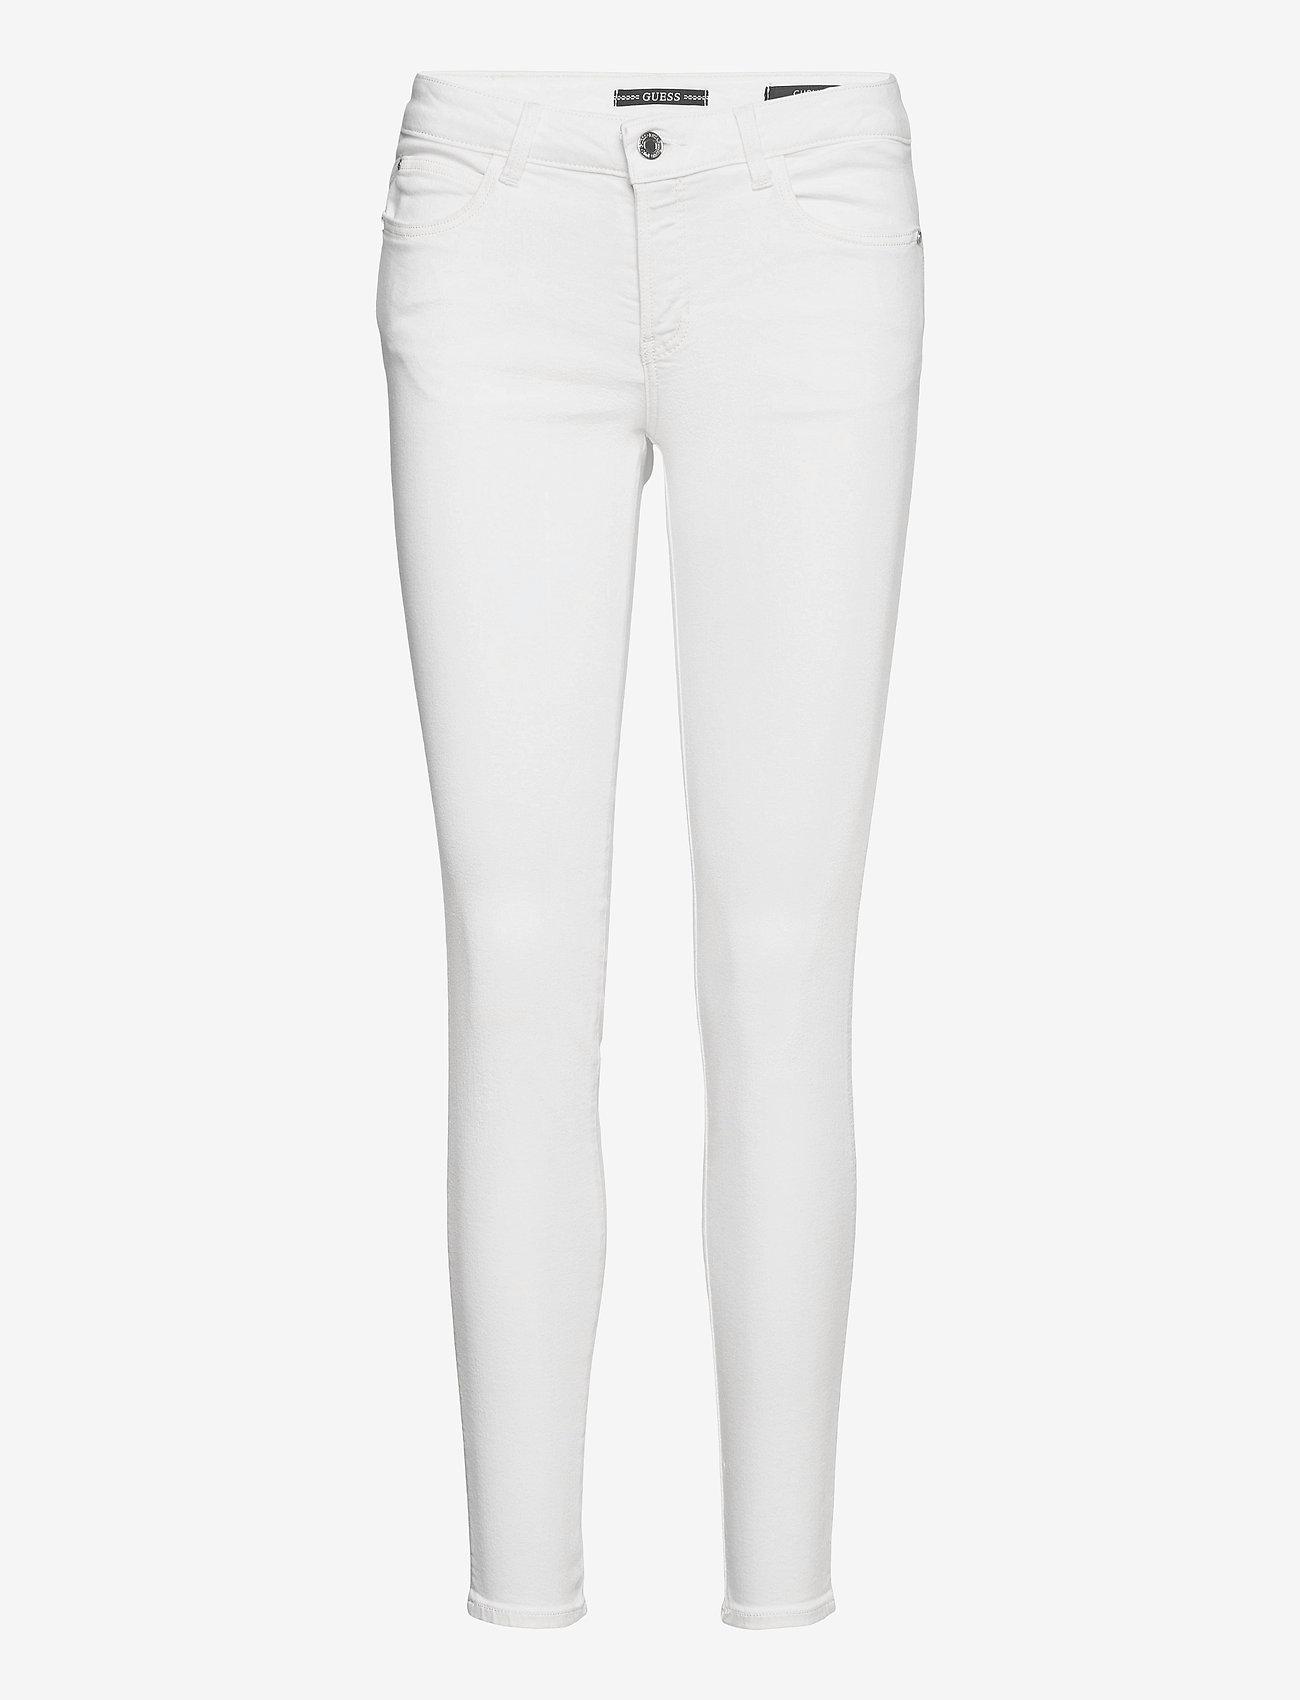 GUESS Jeans - CURVE X - jeans slim - paper moon - 0